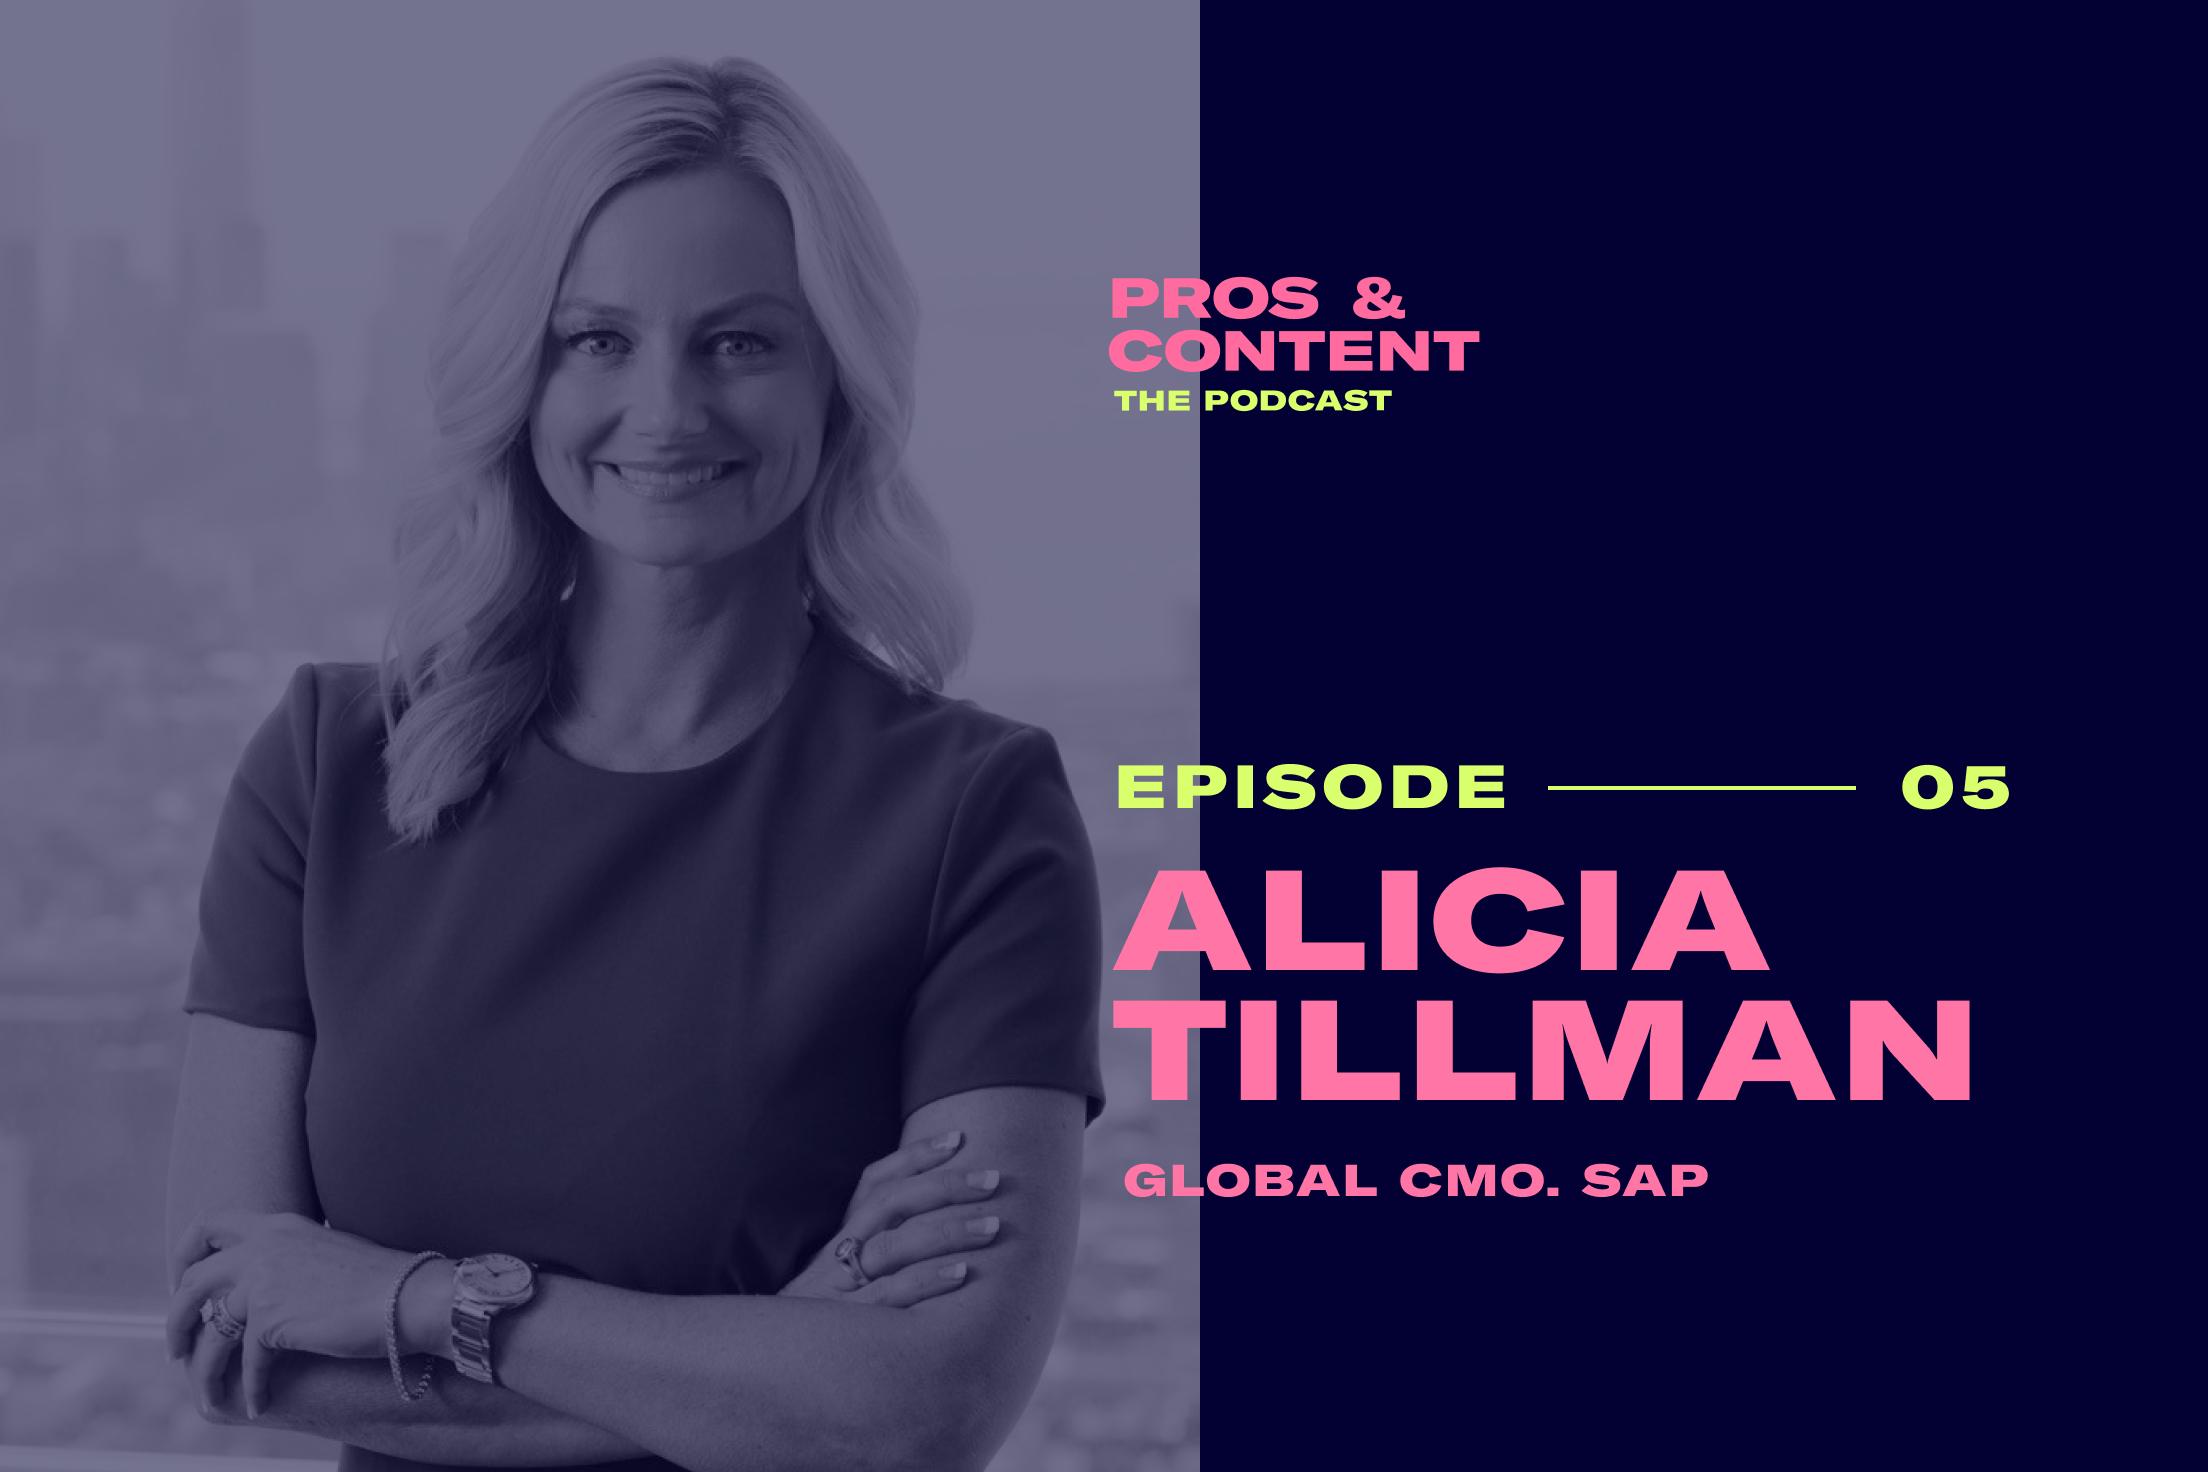 Pros & Content Podcast: Alicia Tillman (Global CMO of SAP)